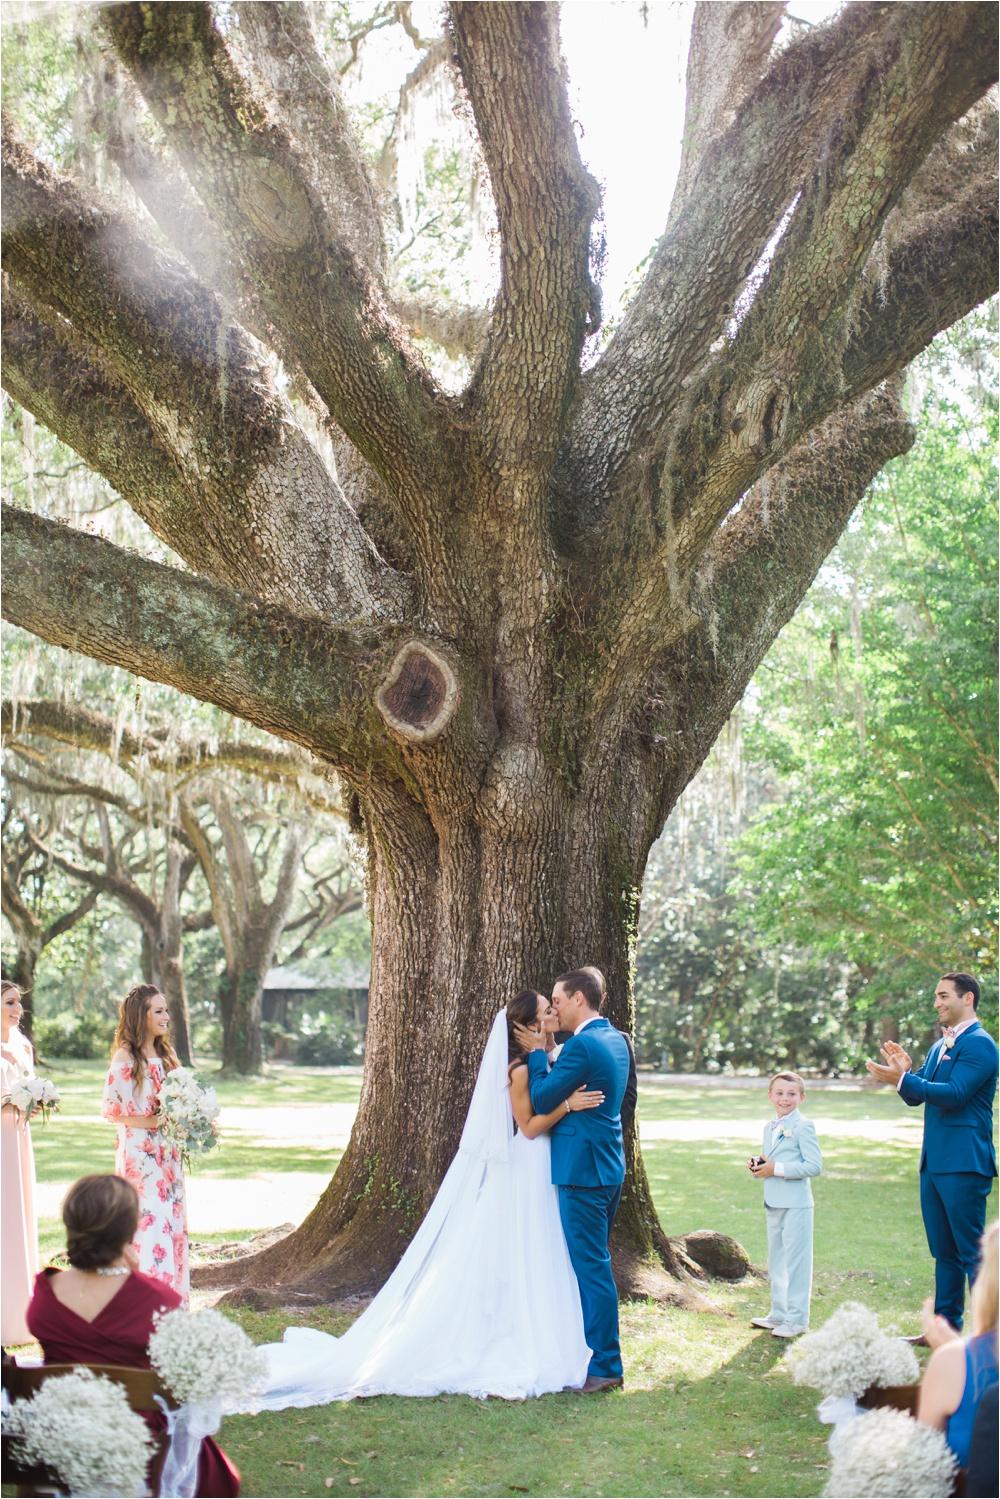 30A Wedding photographer_0033.jpg